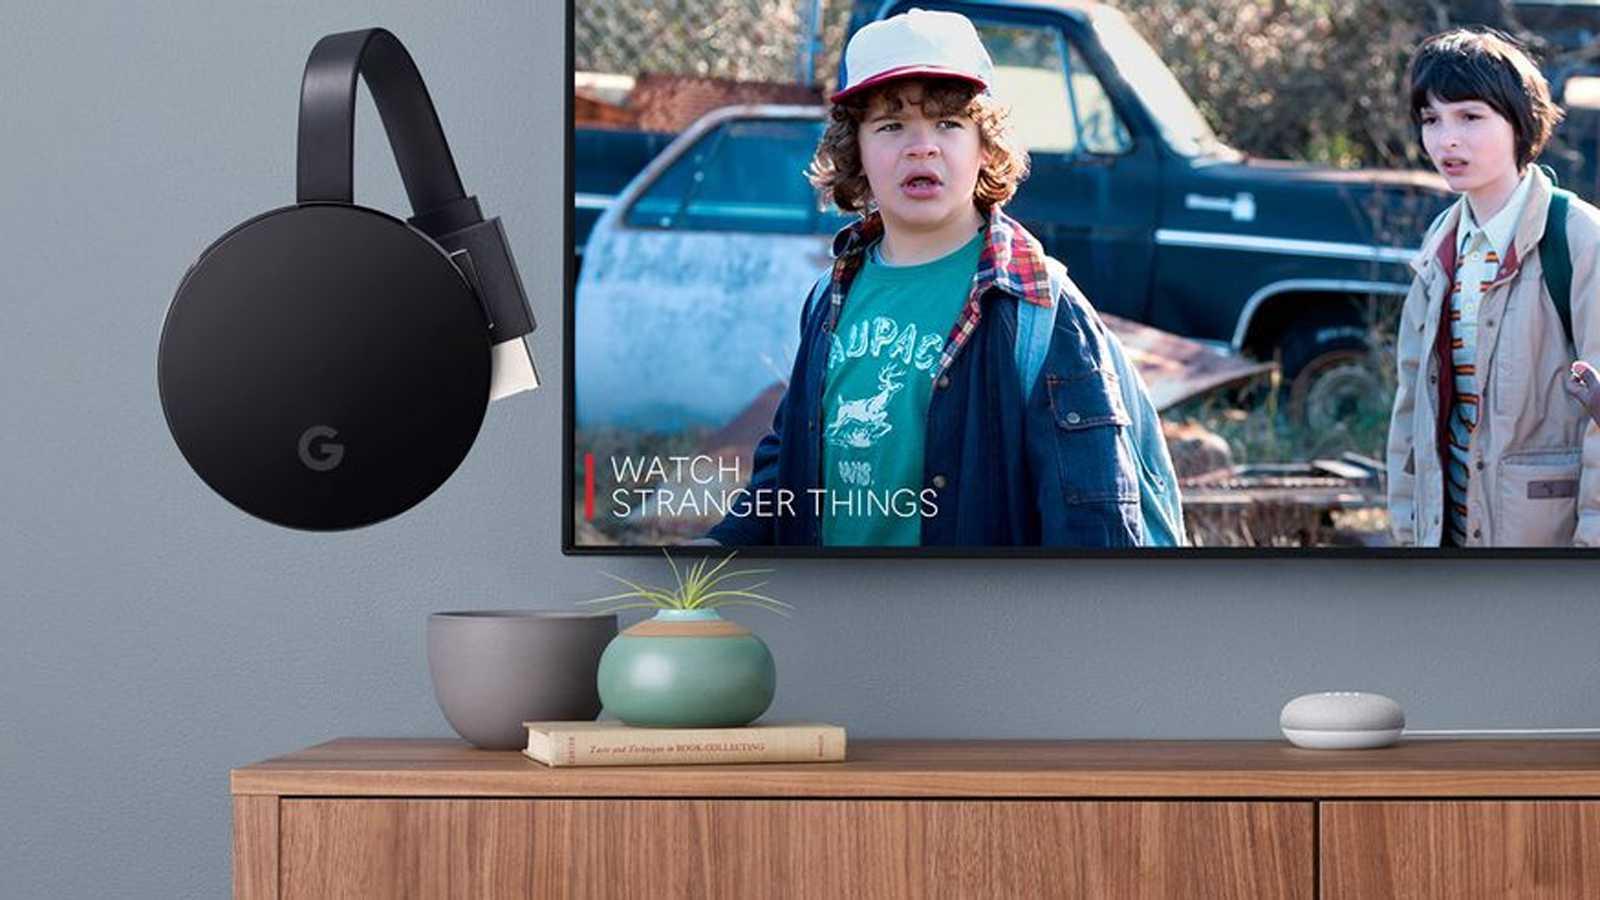 Google Chromecast Ultra - Stream Netflix - GadgetsShop